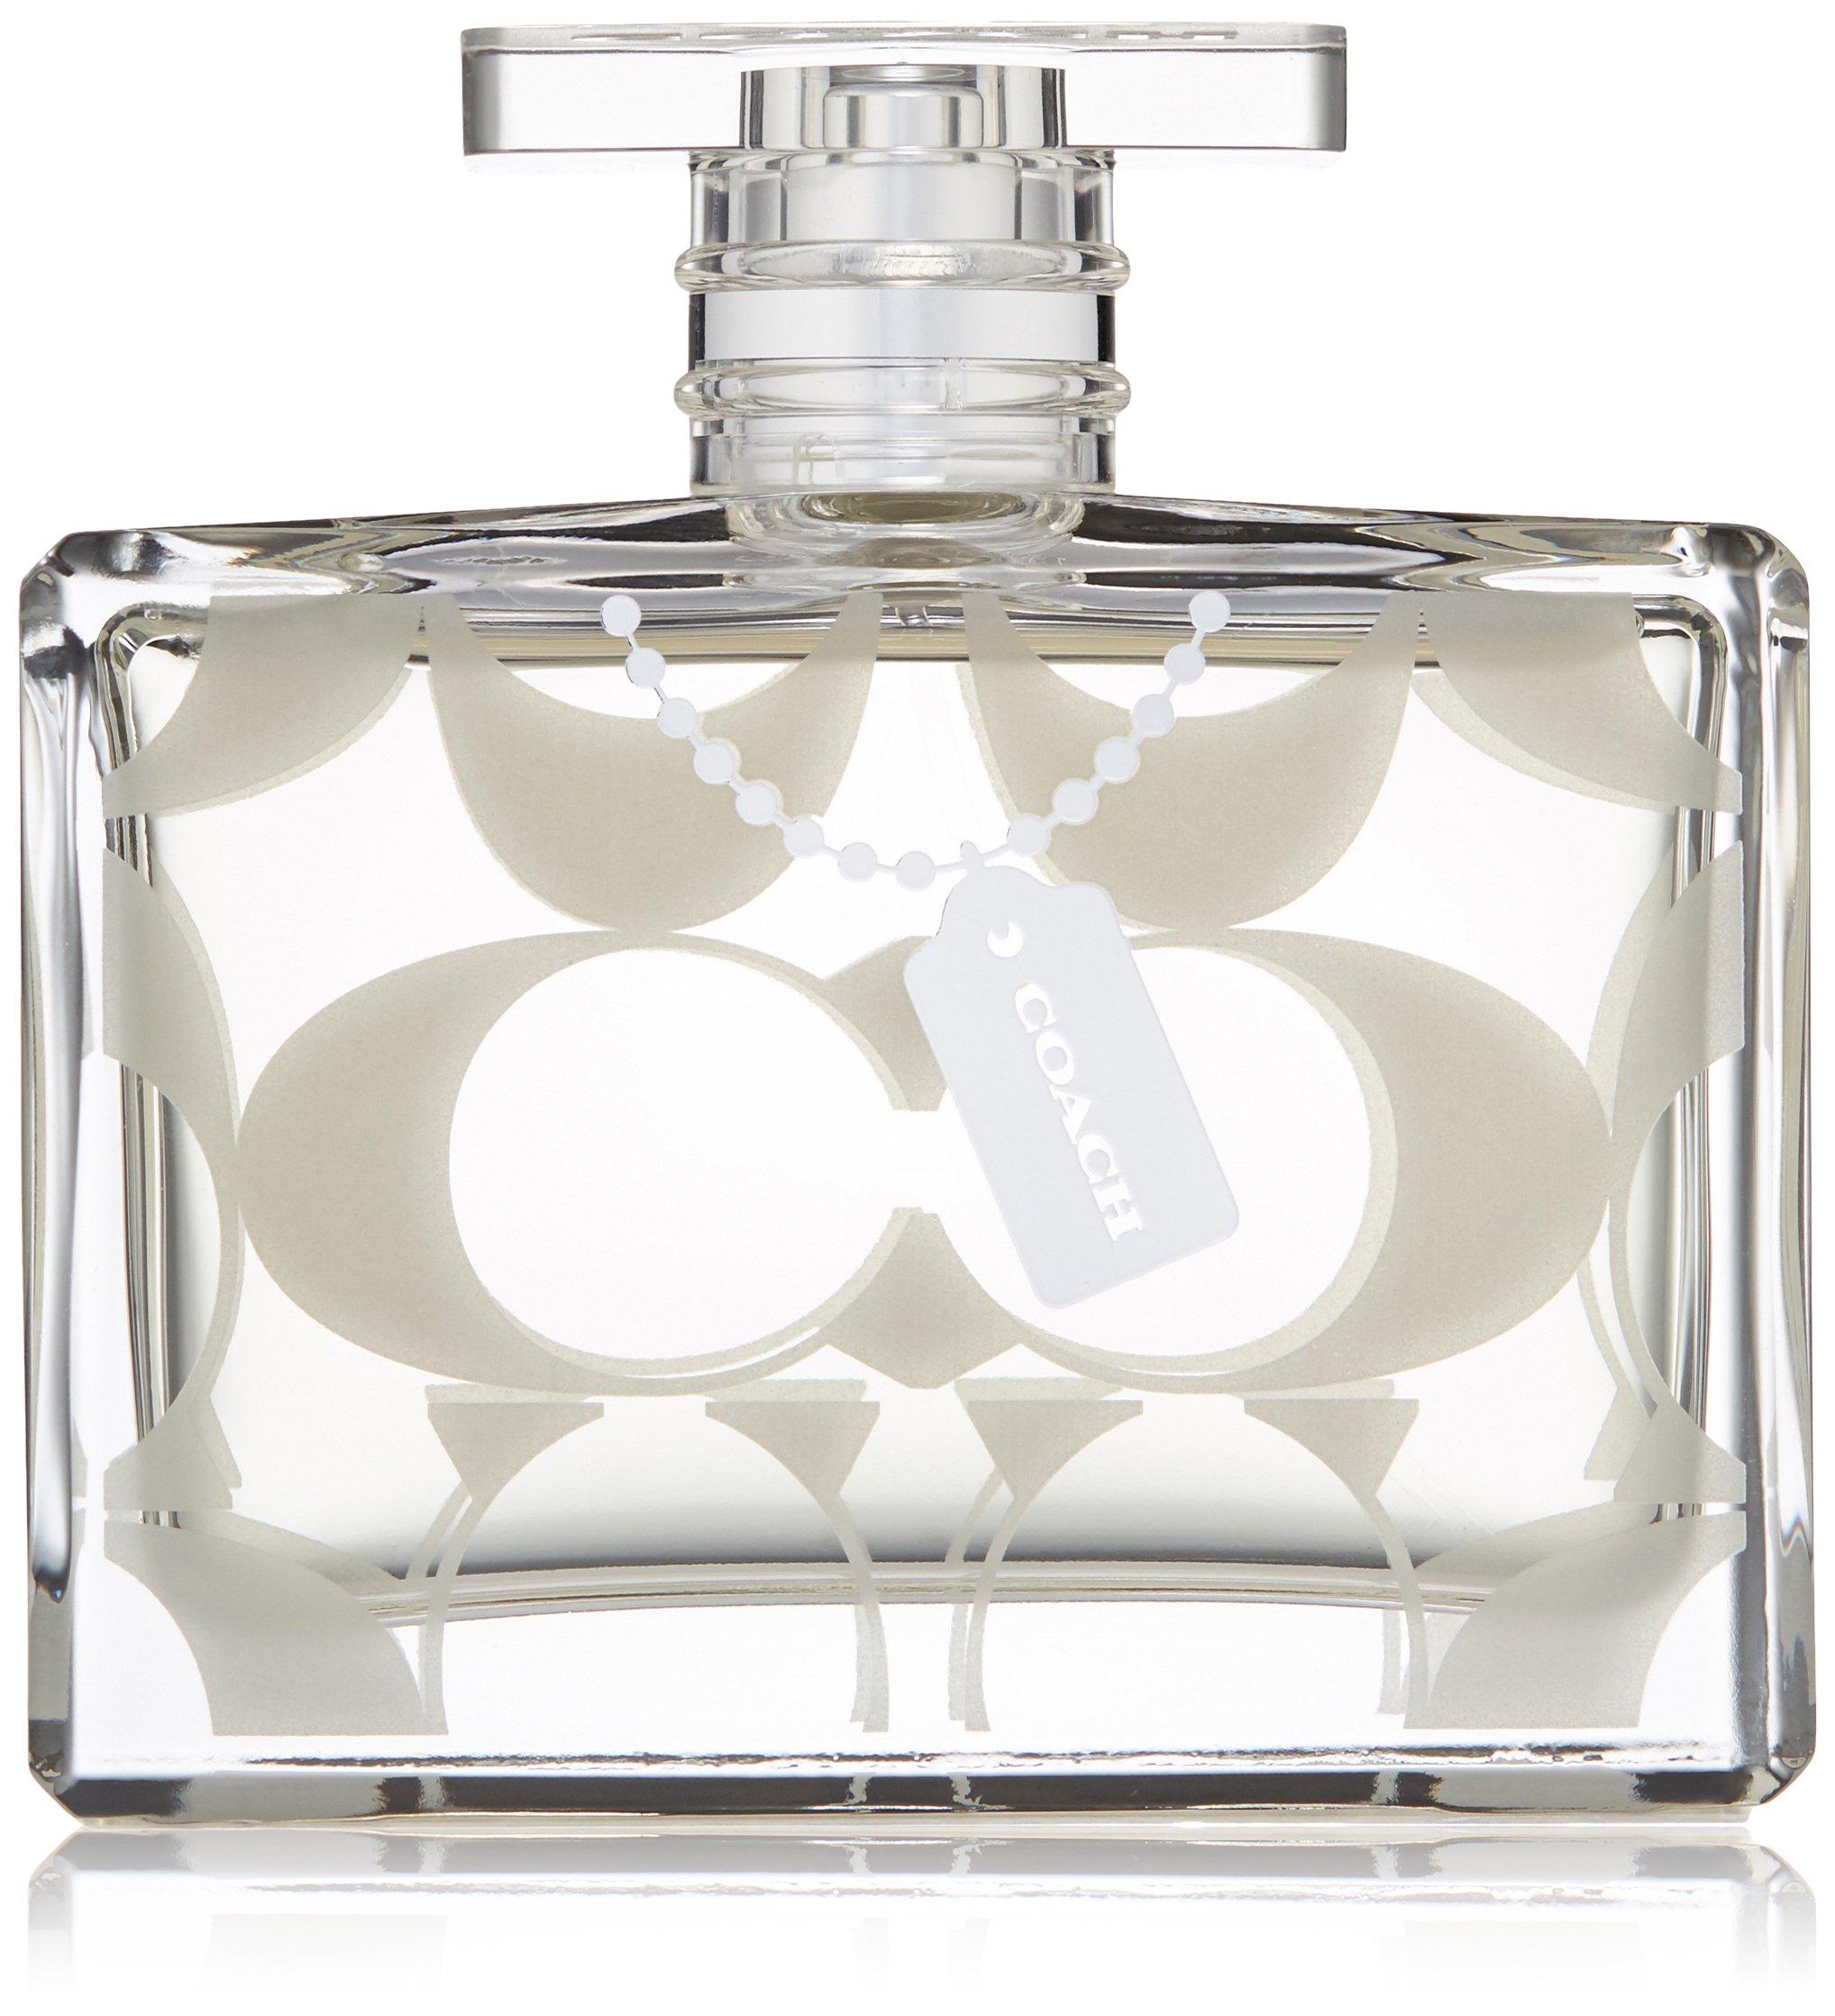 Cõach - Signature Eau De Parfum